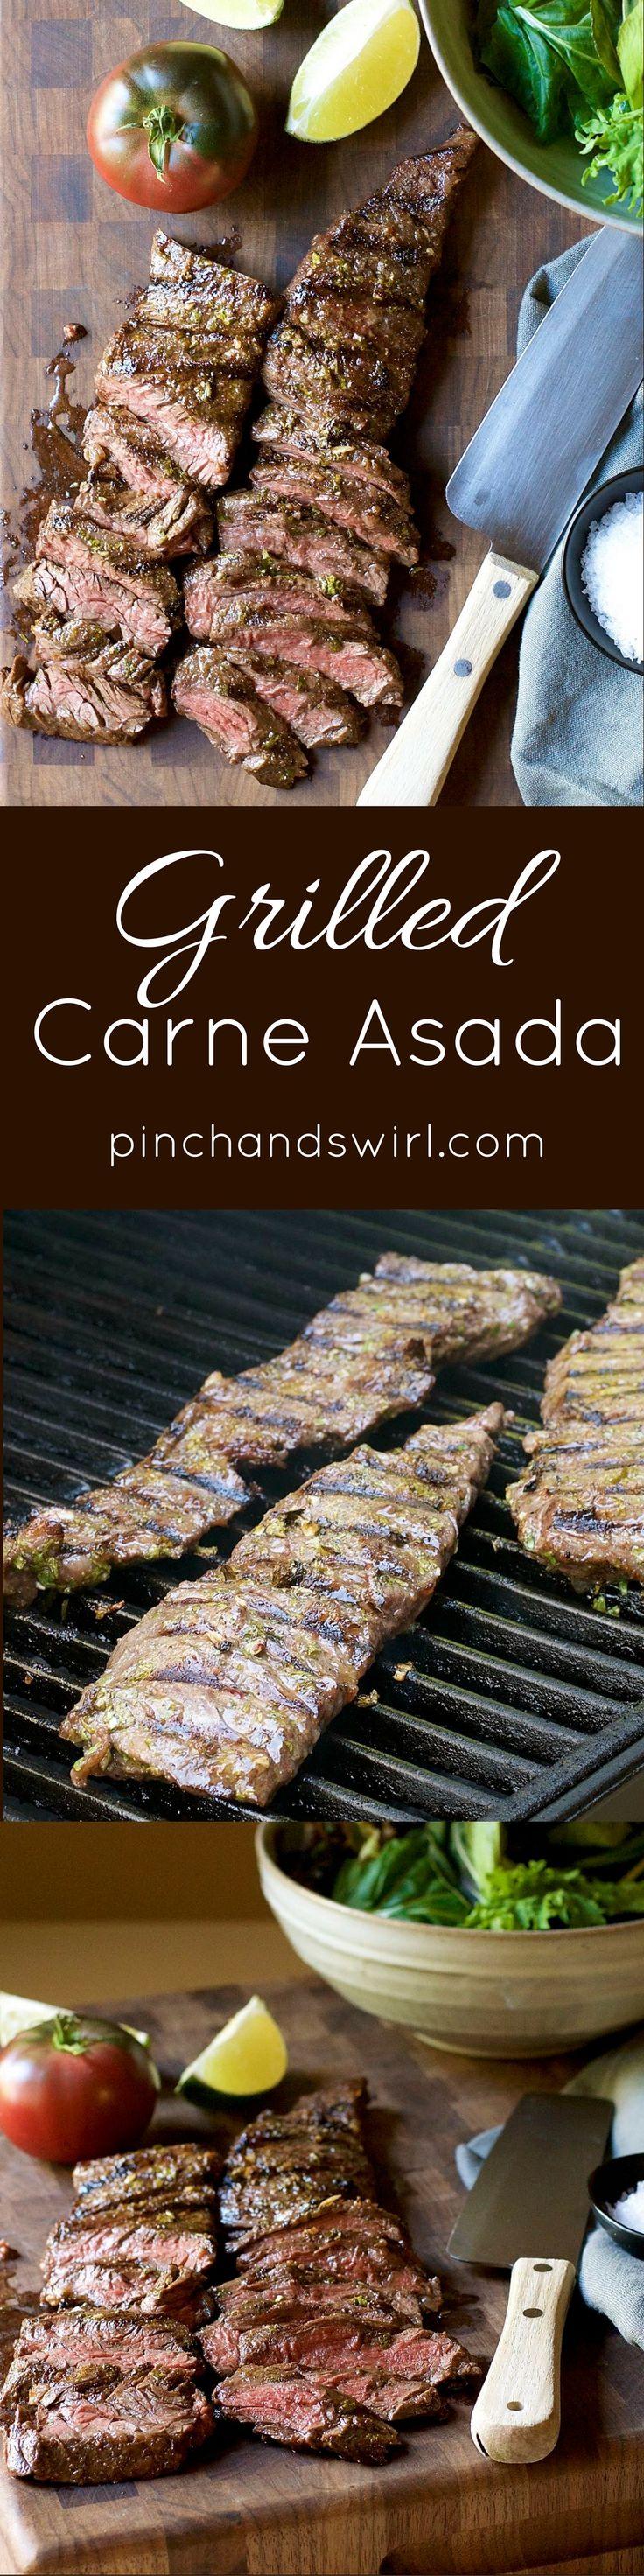 Grilled Carne Asada - delicious and so easy! #easyrecipes #carneasada